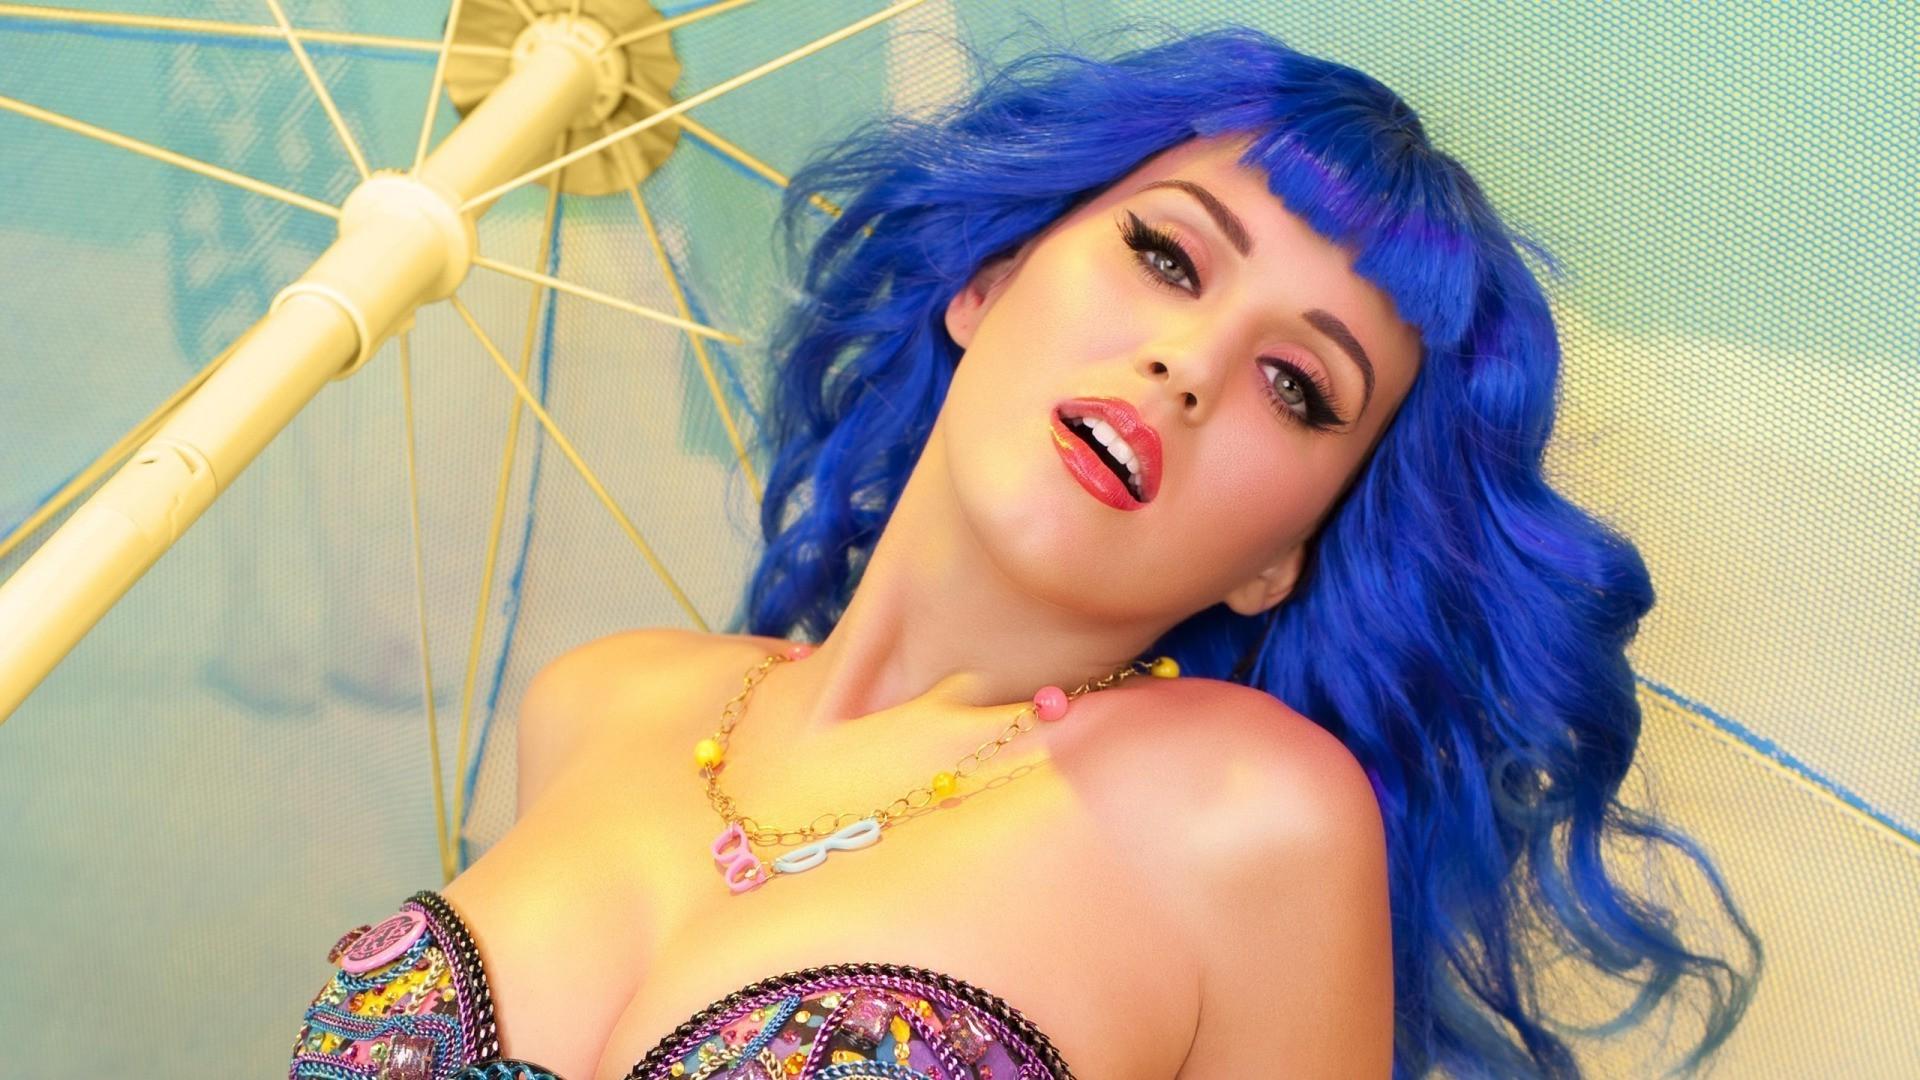 Katy Perry HD Wallpaper 1920×1080